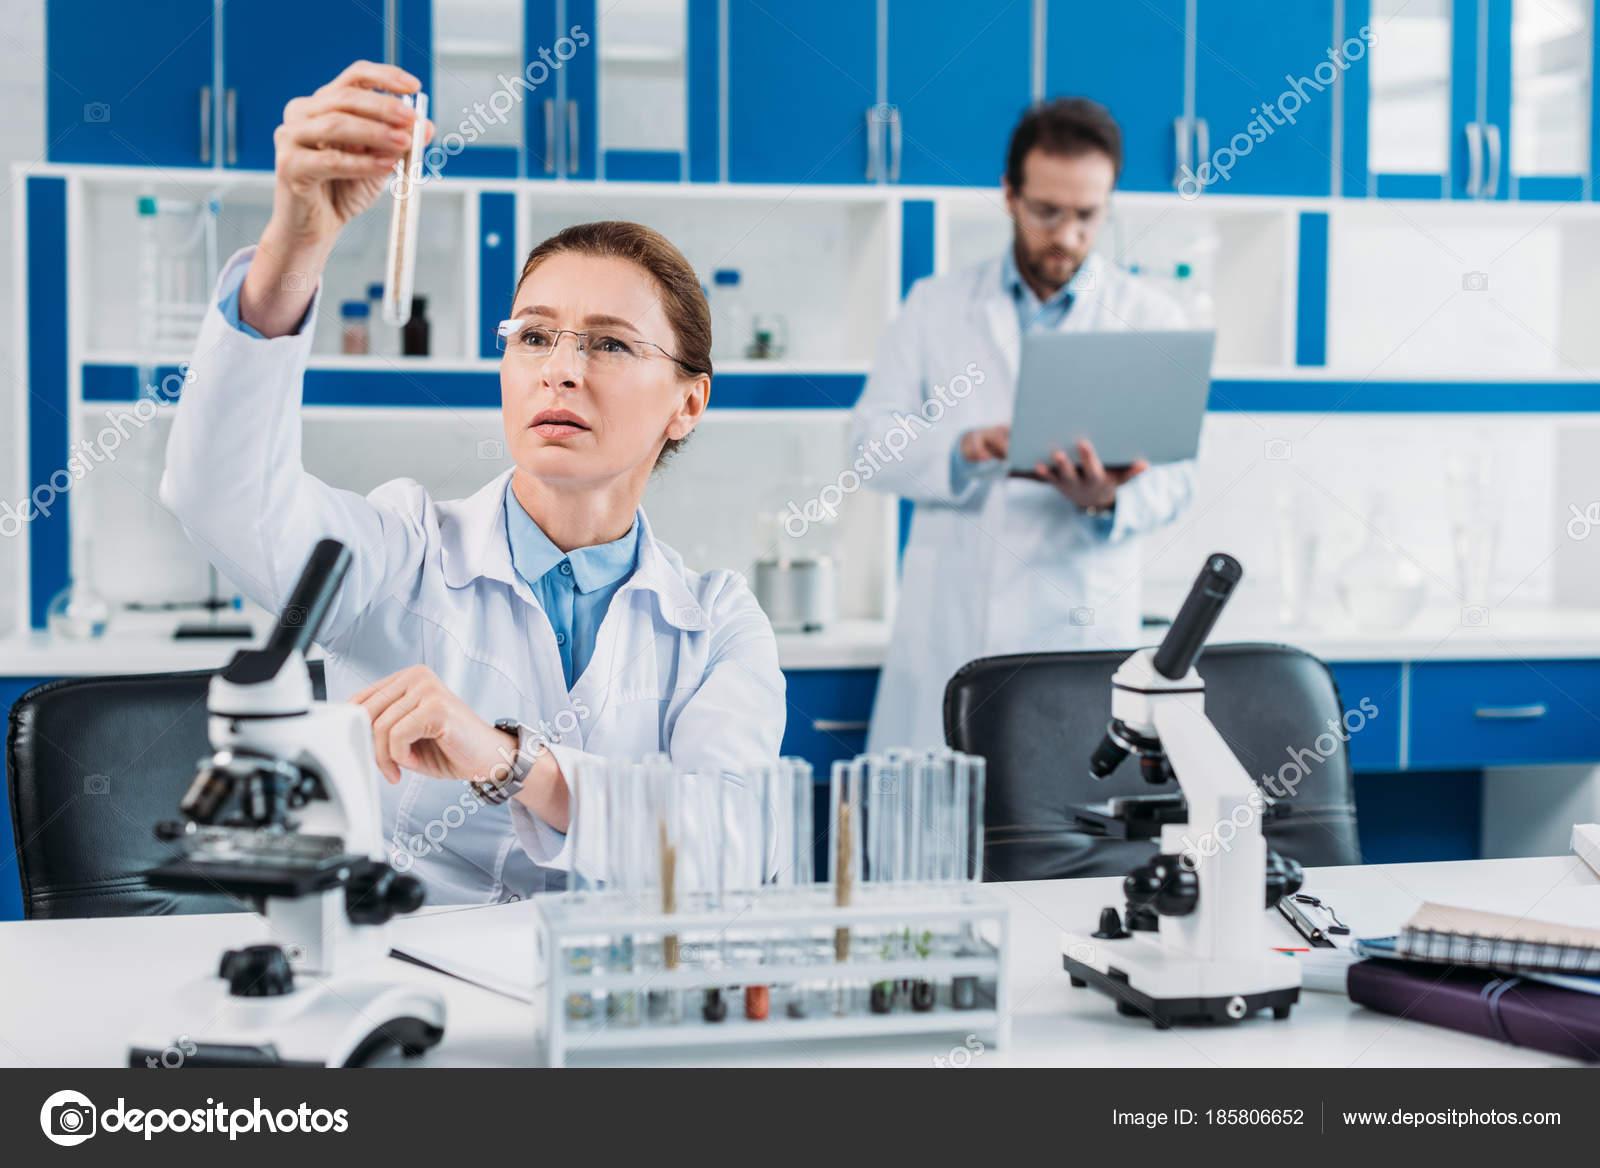 You Hand job lab this